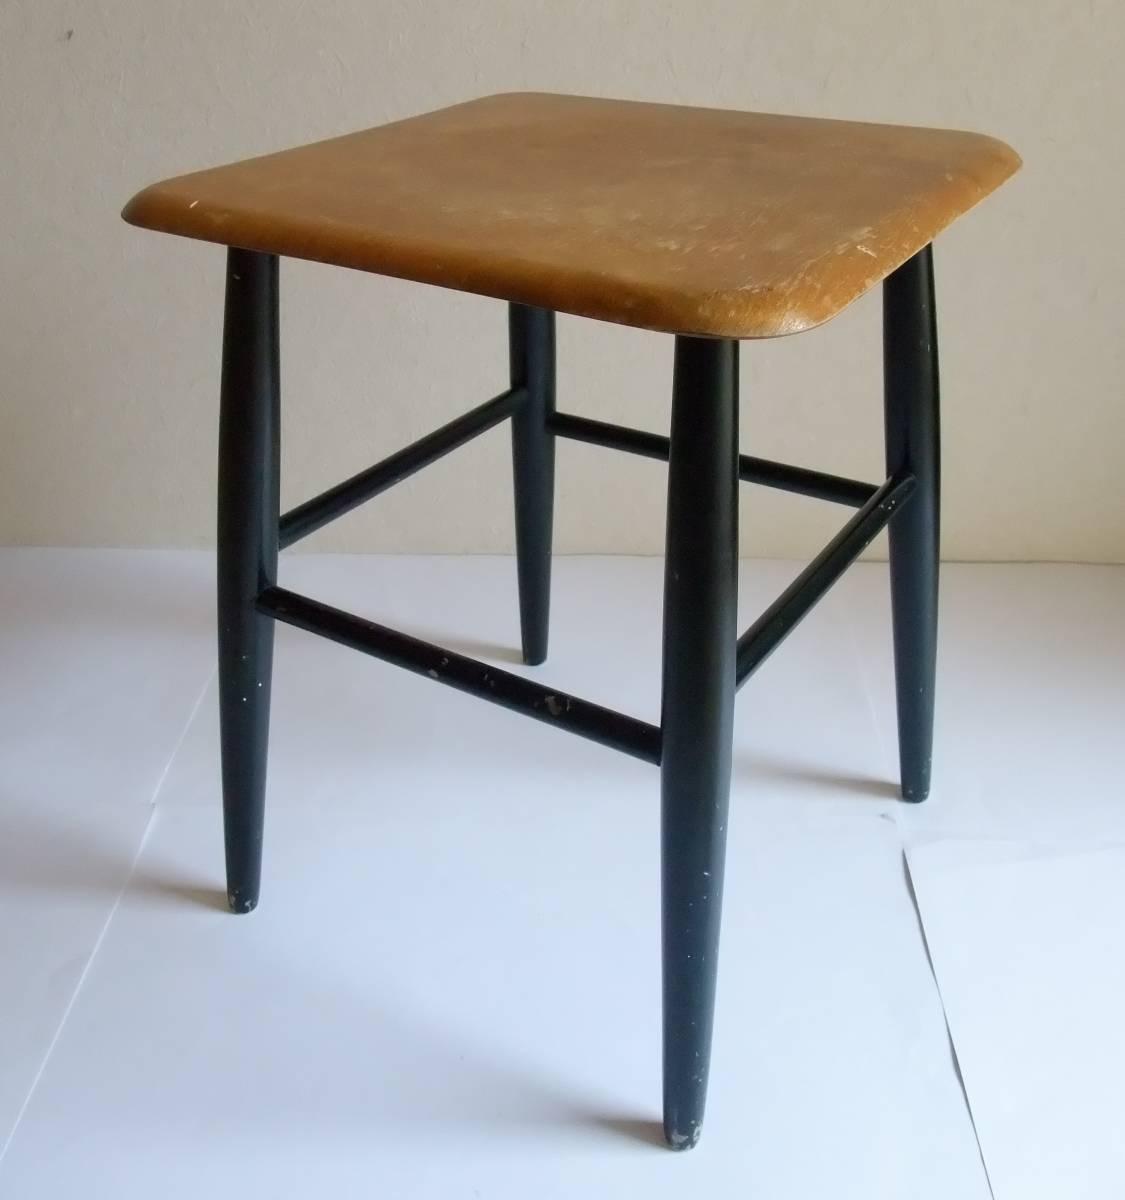 Pleasant Northern Europe Il Mali Tapiova Rough Net Stool Ilmari Theyellowbook Wood Chair Design Ideas Theyellowbookinfo